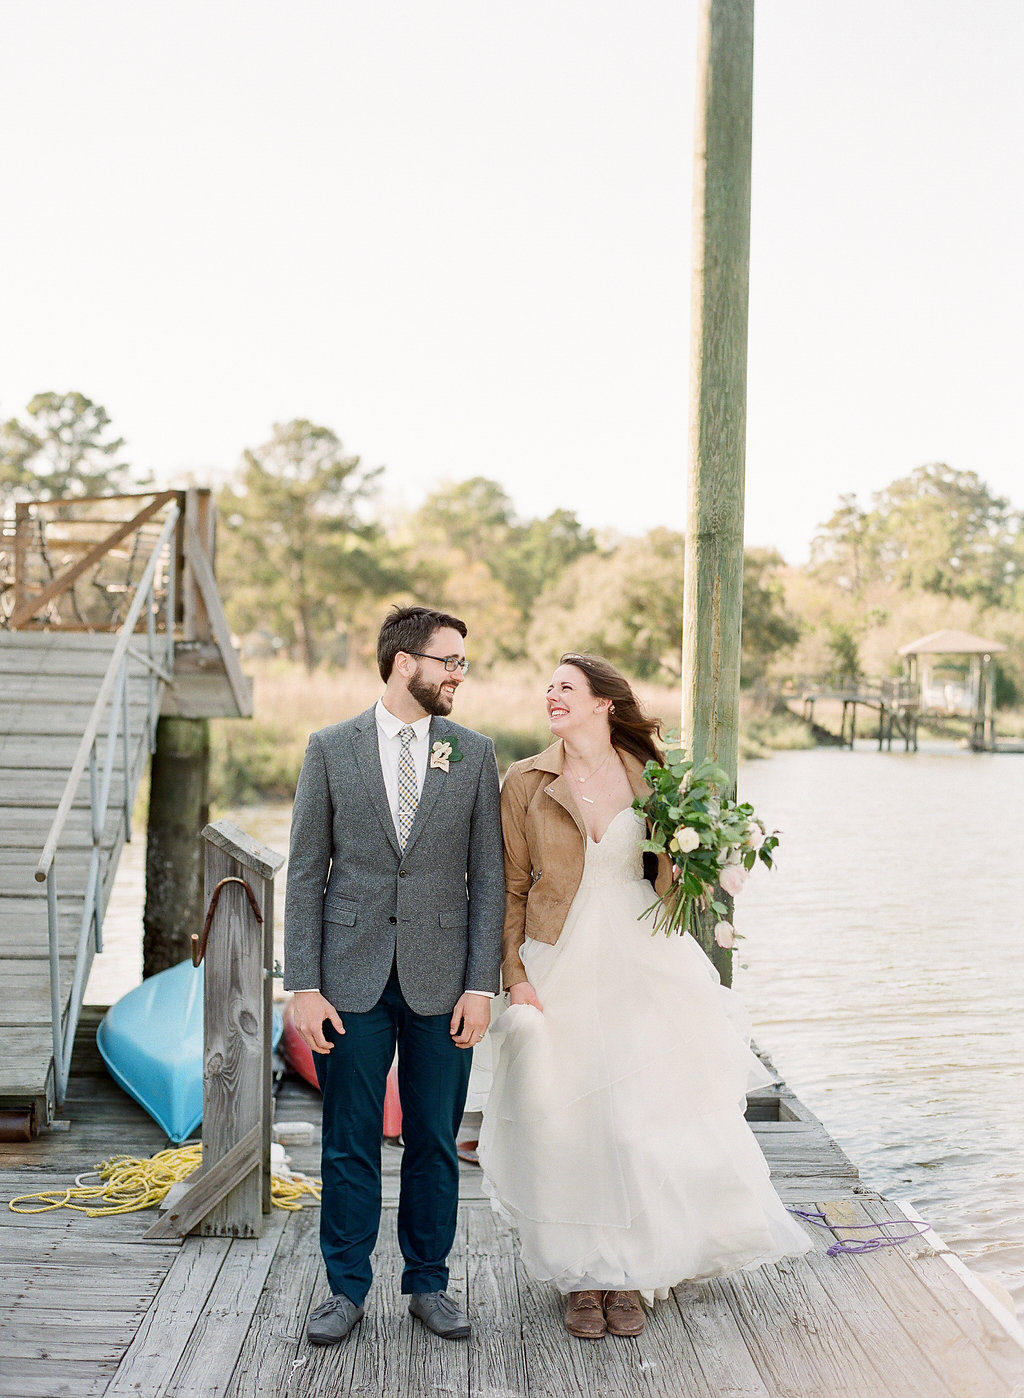 sarah-seven-worthington-wedding-dress-ivory-and-beau-savannah-bridal-boutique-savannah-wedding-dresses-savannah-bridal-shop-organza-wedding-dress.jpg